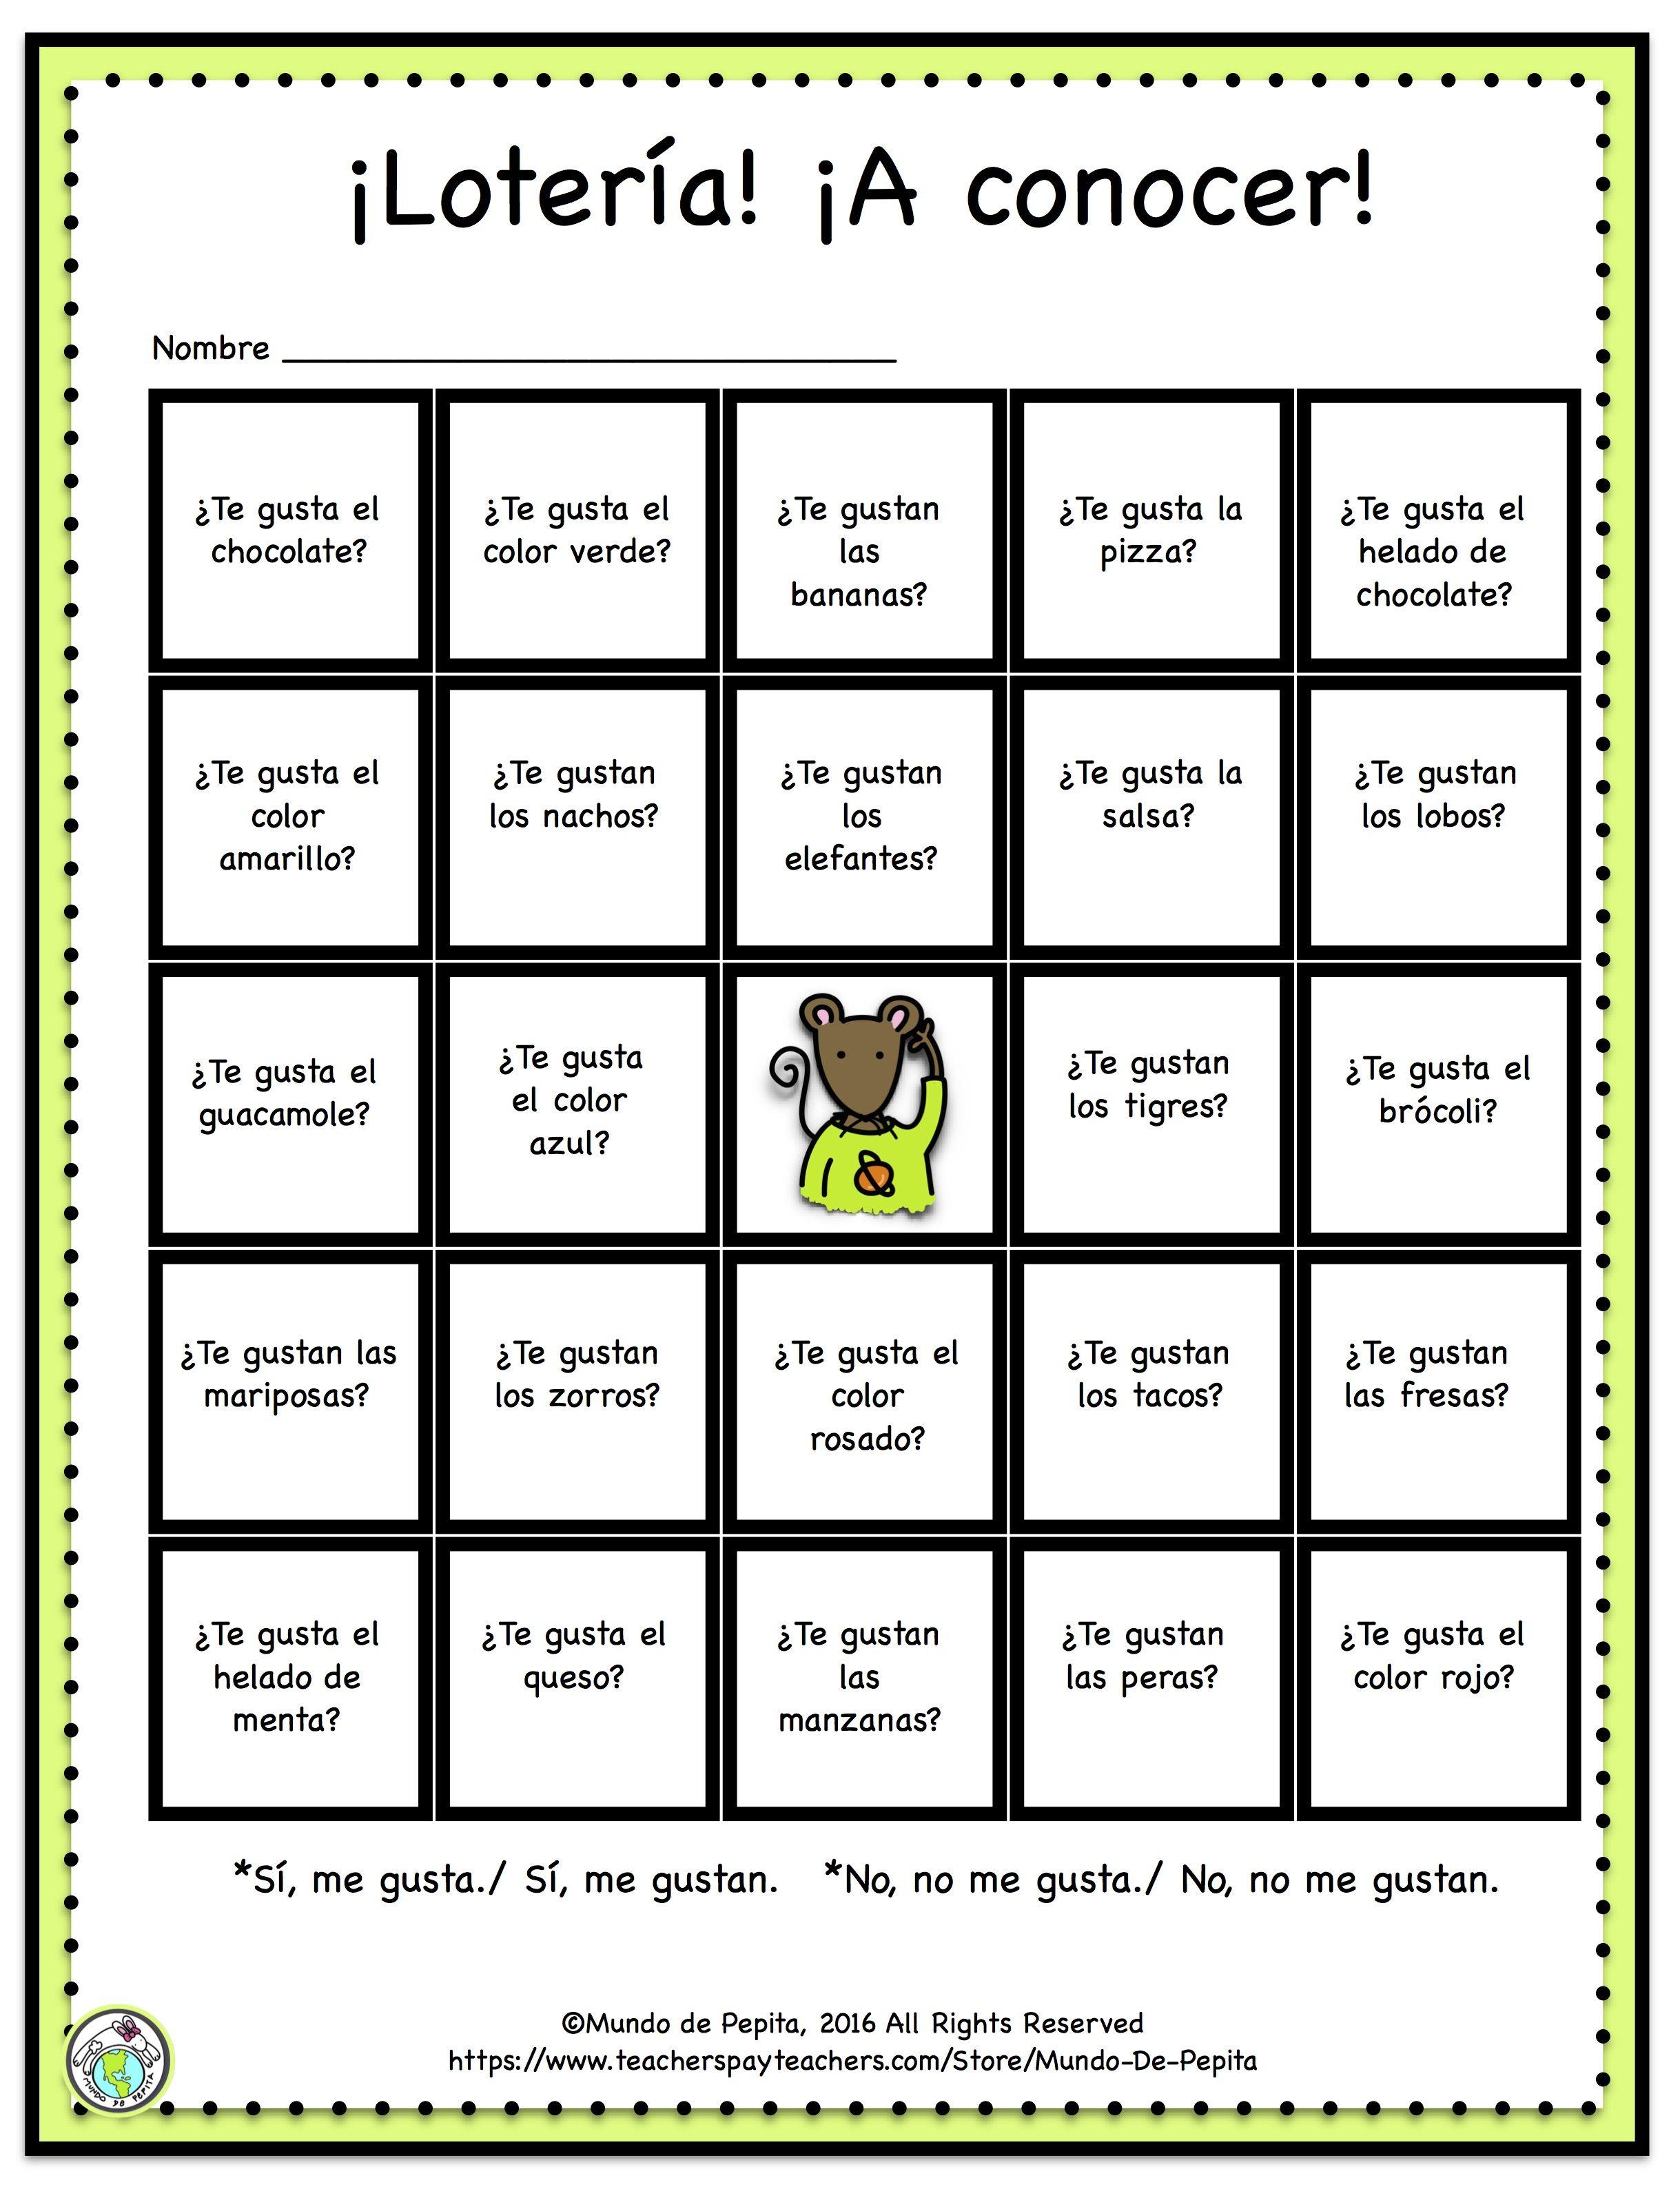 Free Loteria Bingo Getting To Know You Me Gusta